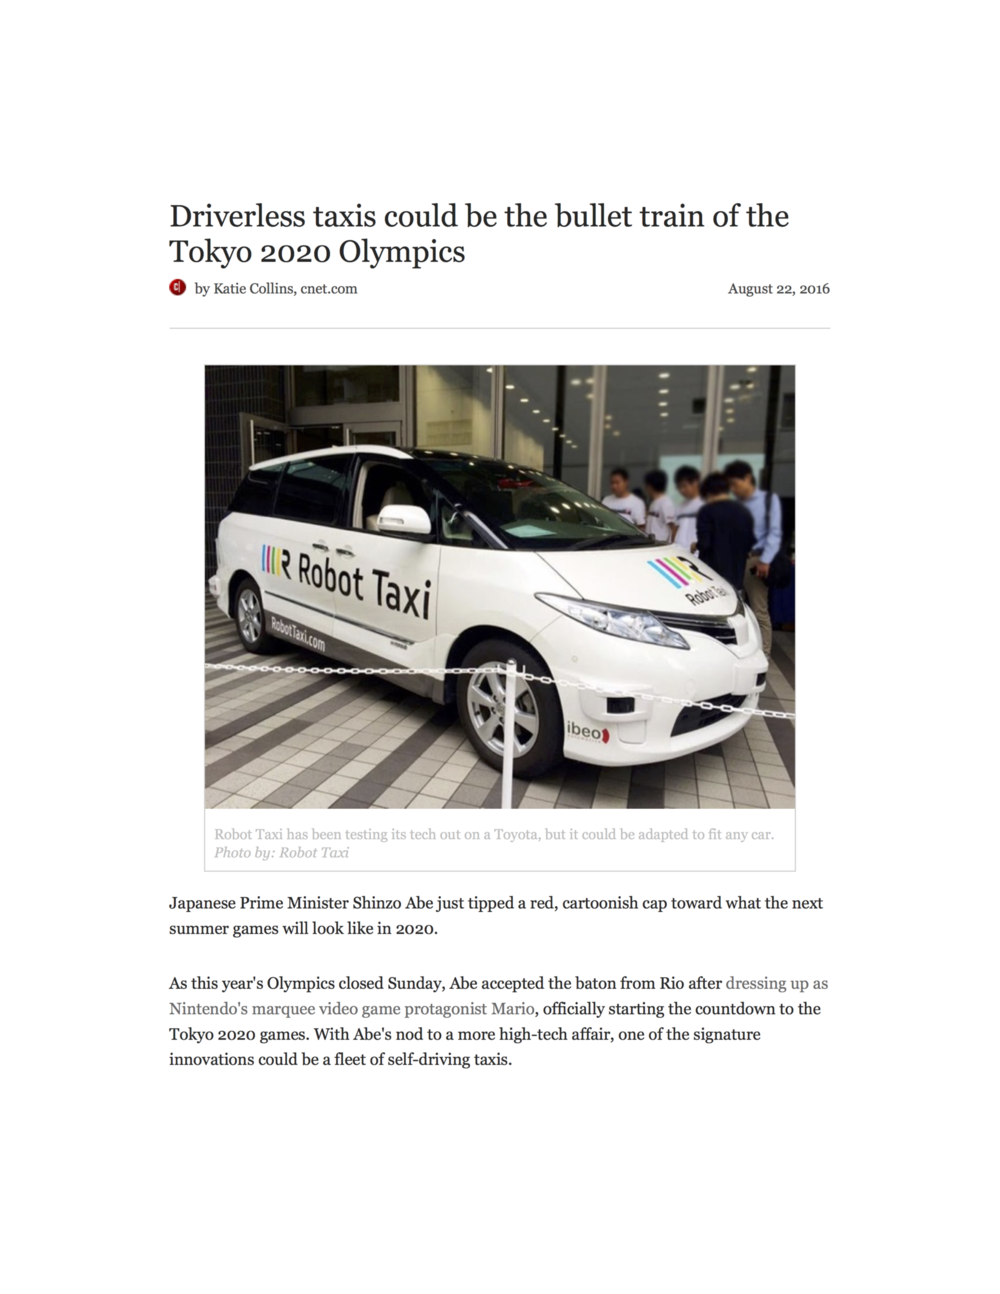 Driverless Tokyo1.png